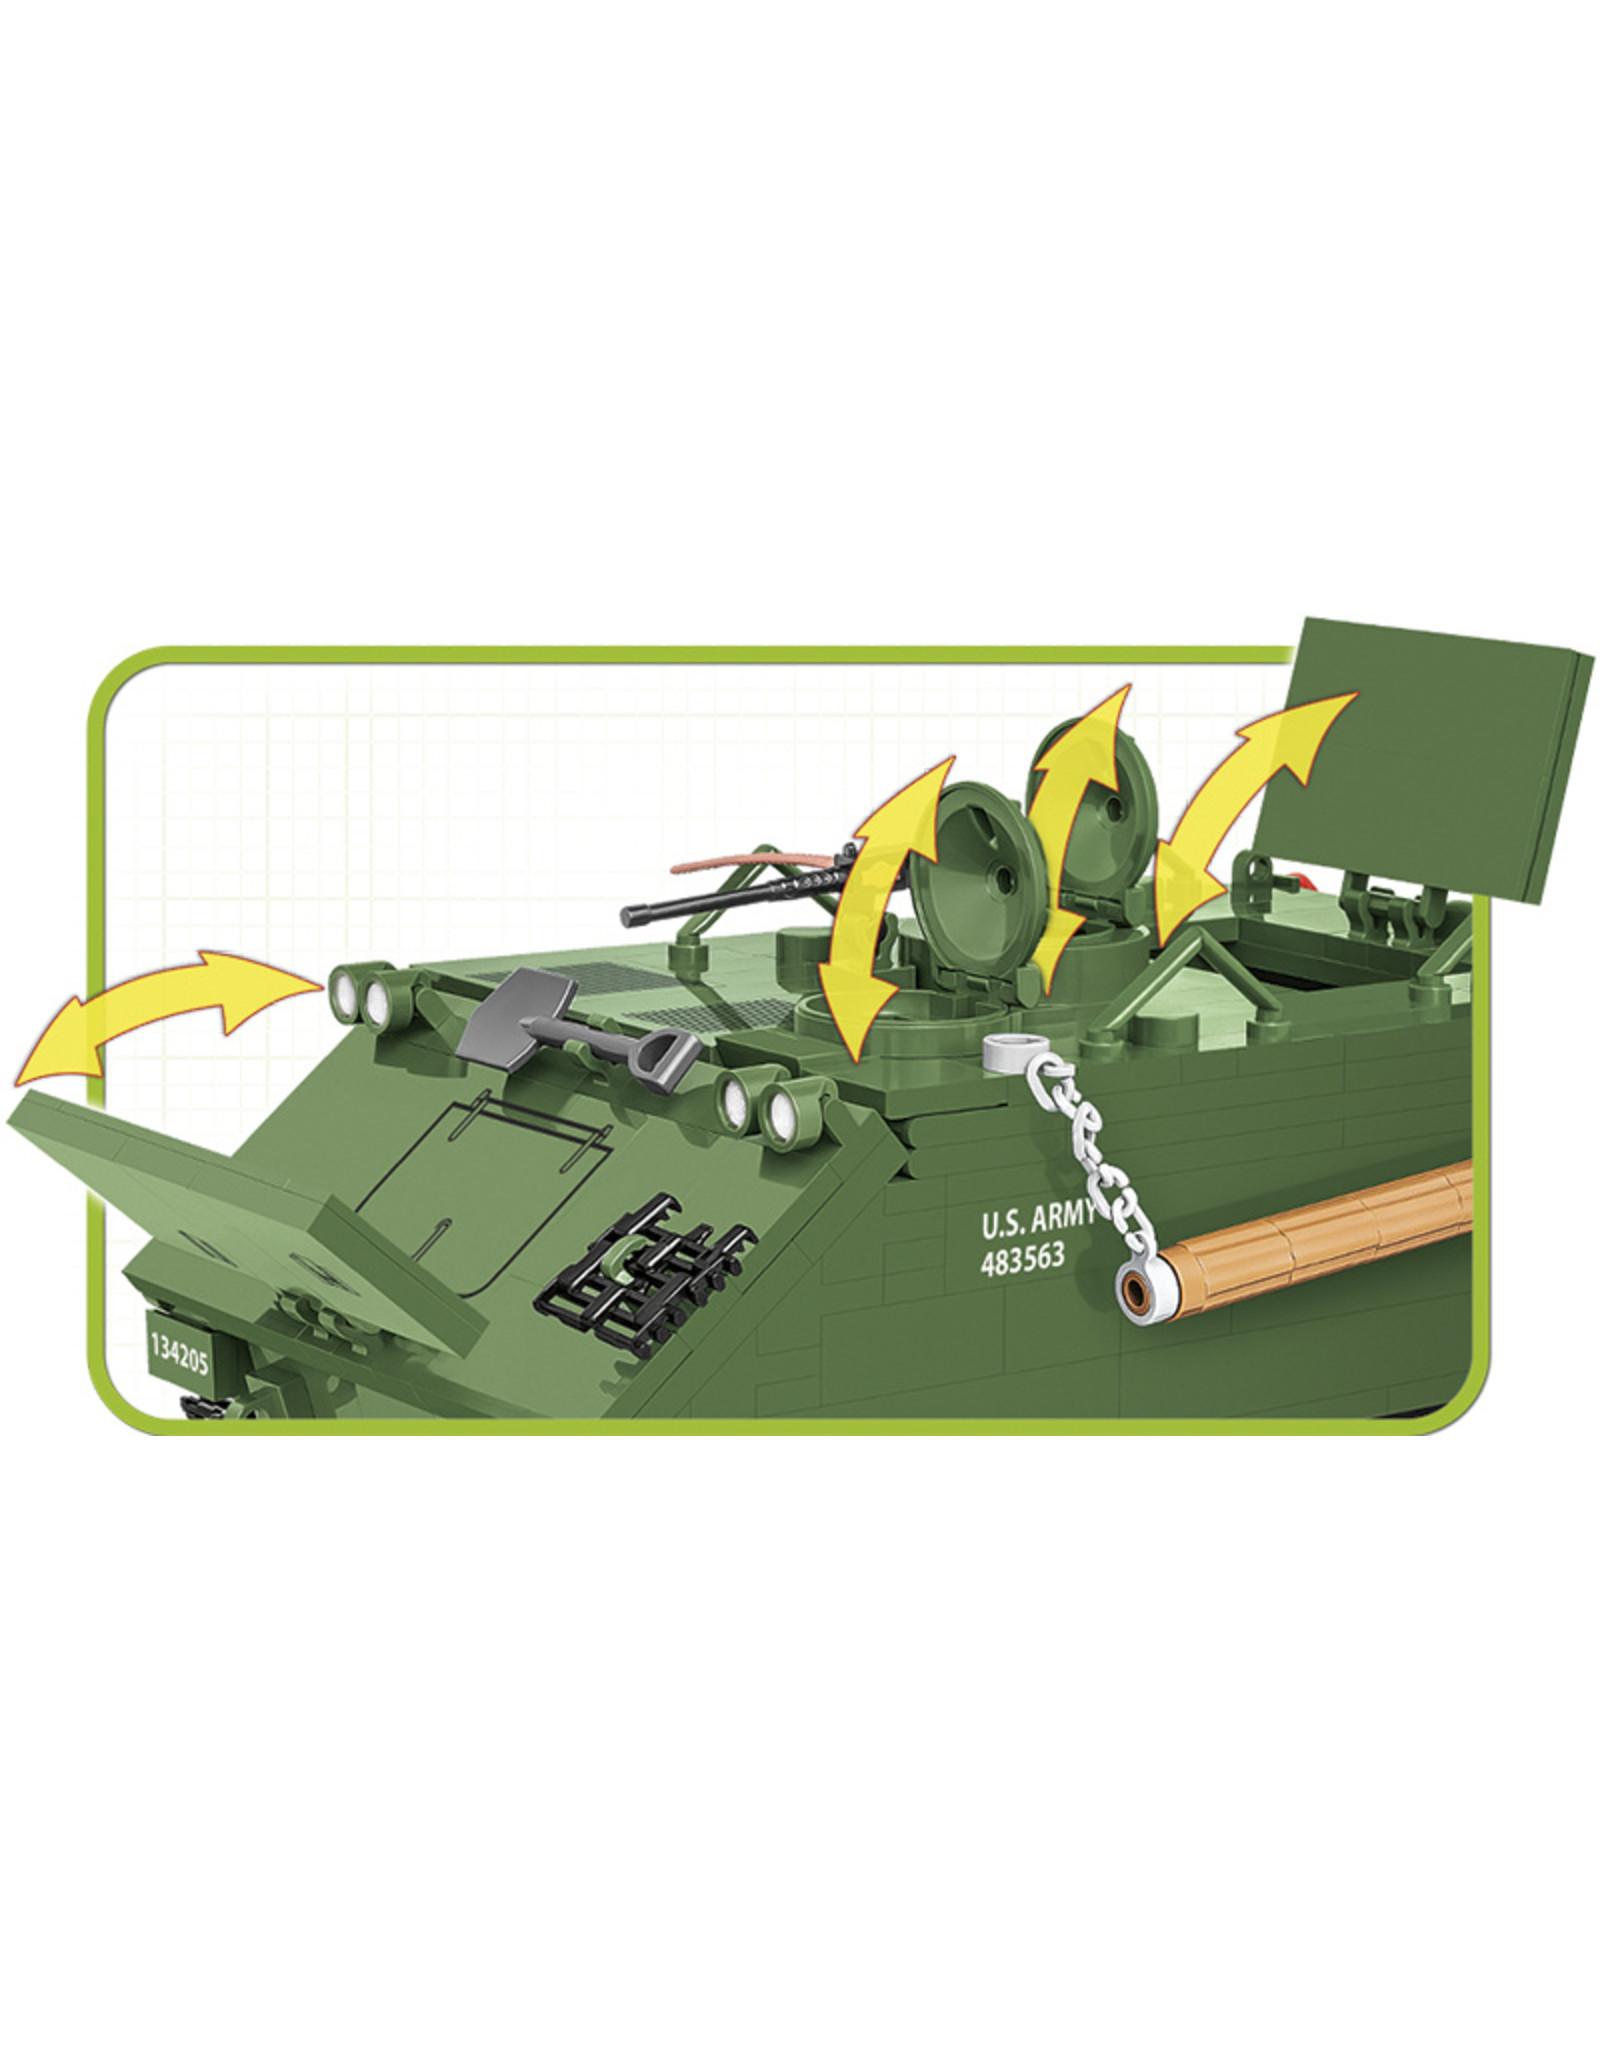 COBI COBI 2236 M113 APC Vietnam War